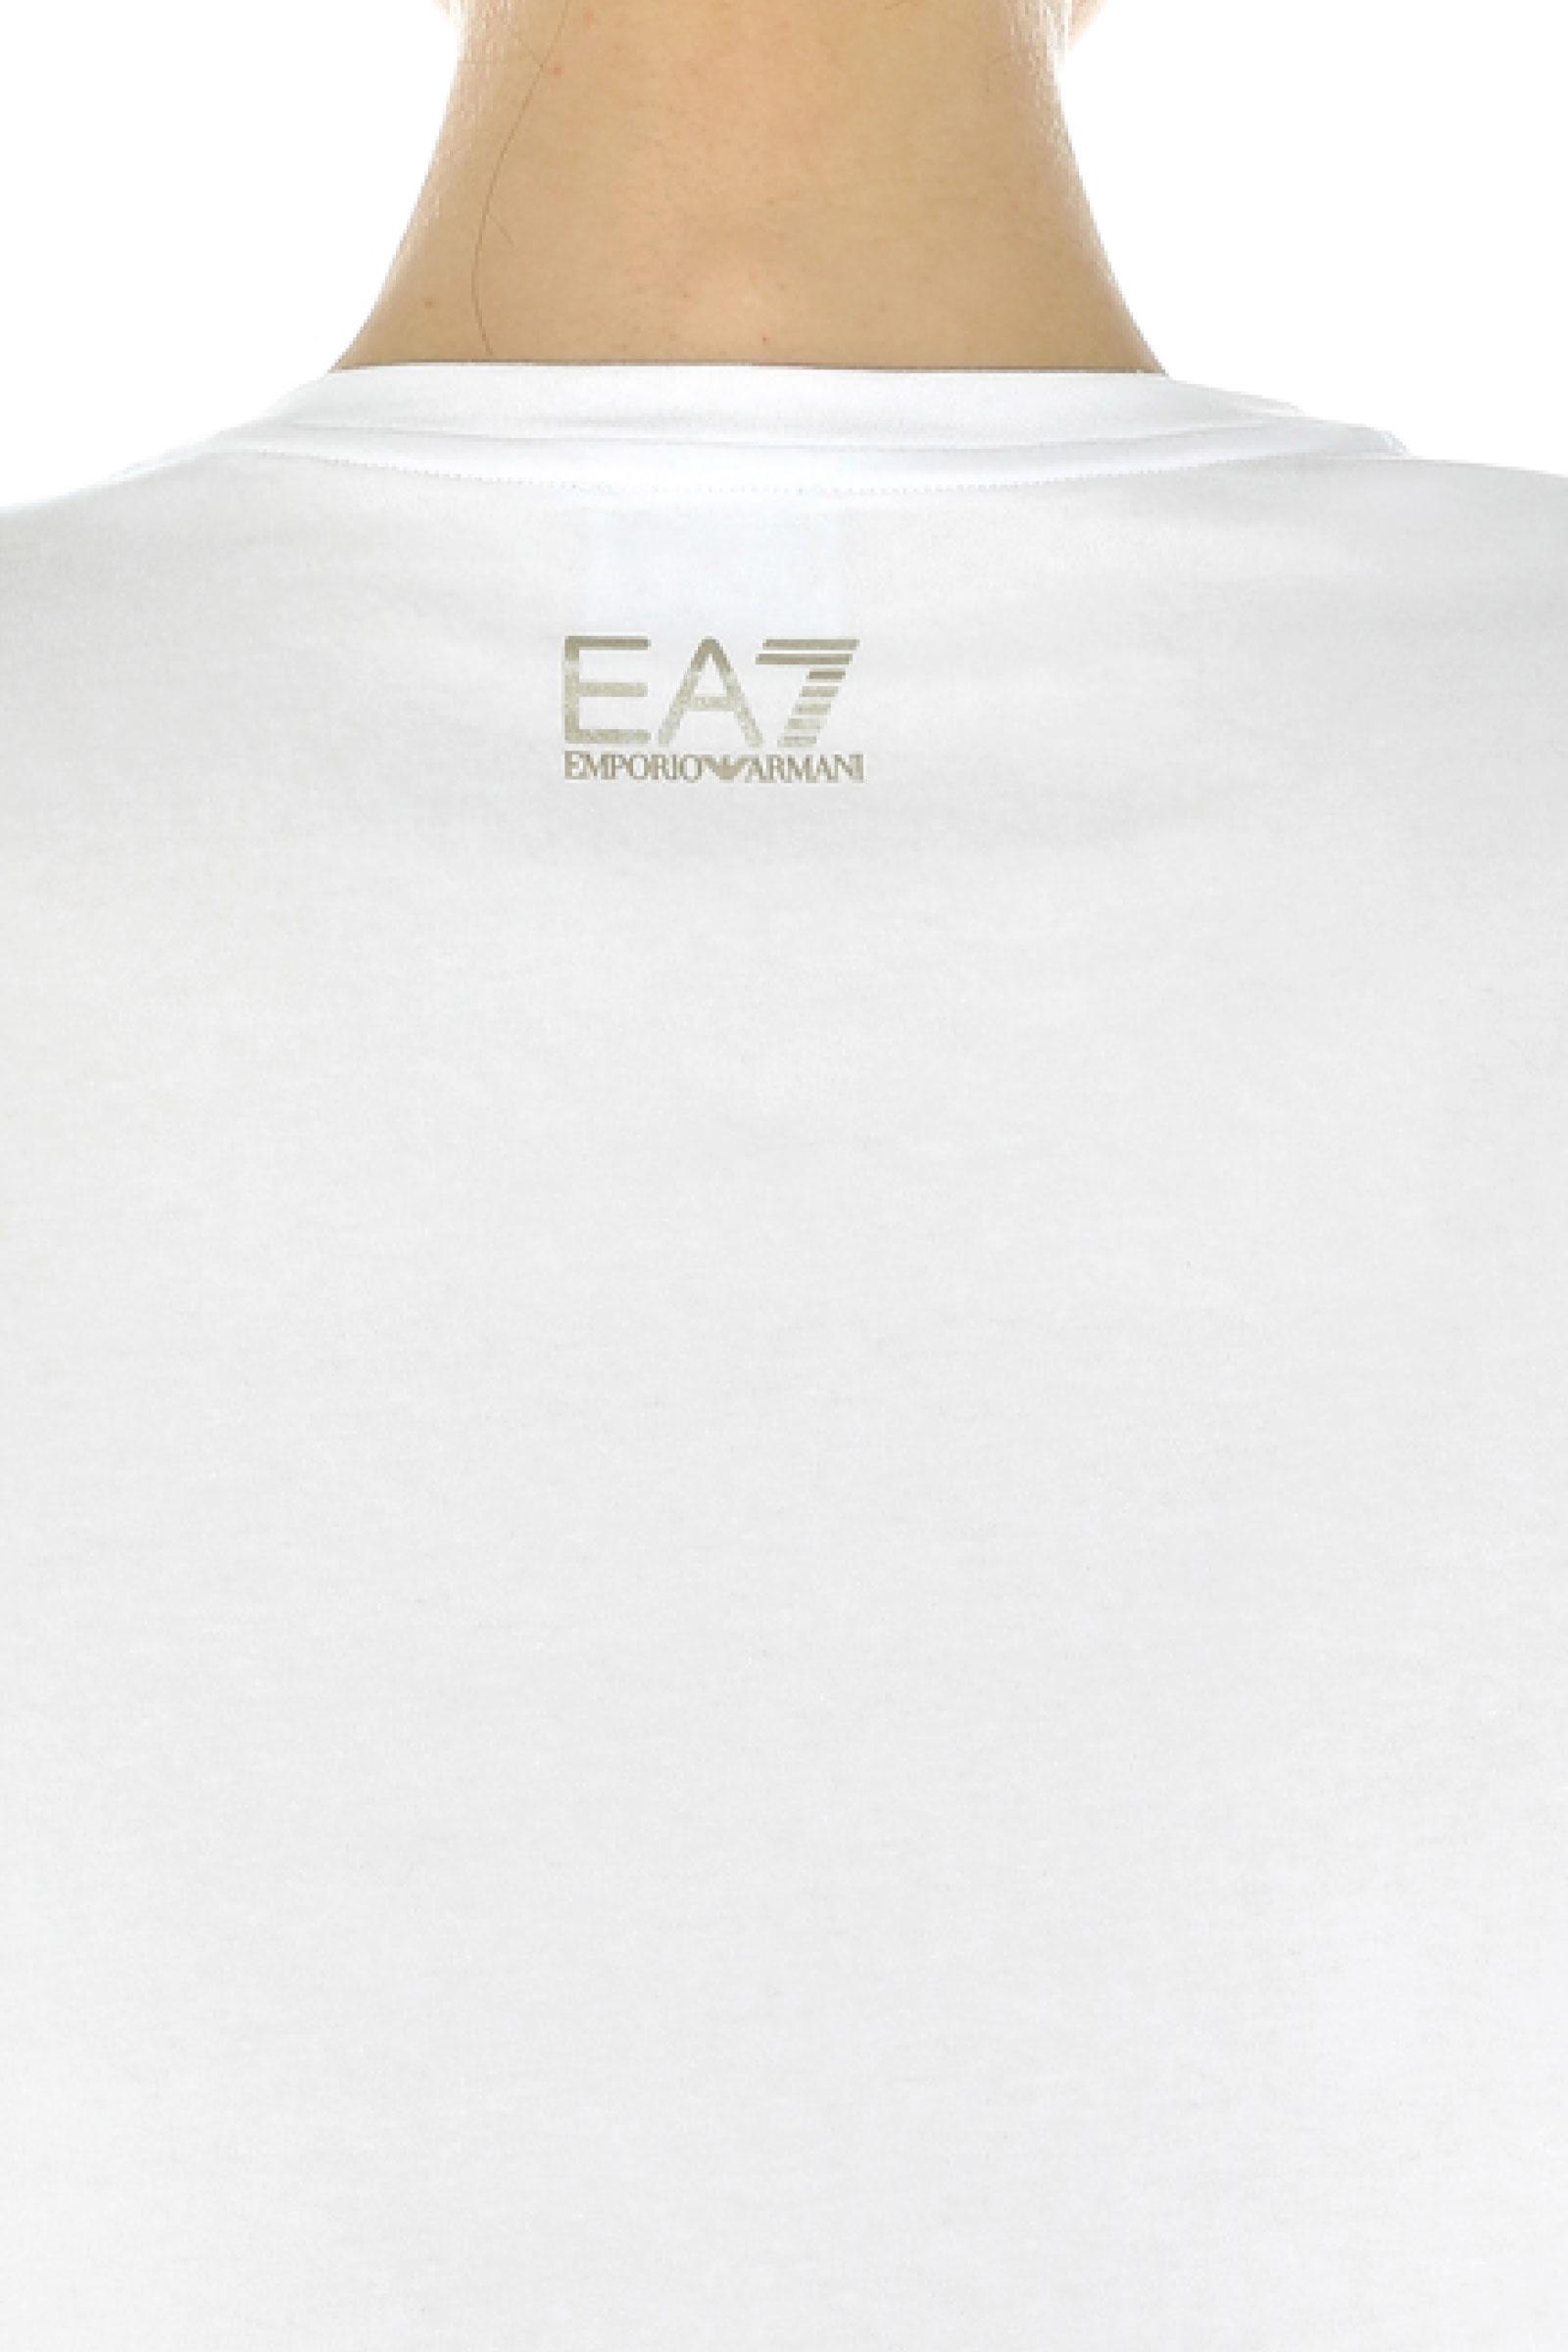 ARMANI EA7 Women's T-Shirt ARMANI EA7 | T-Shirt | 3KTT28 TJ12Z1100